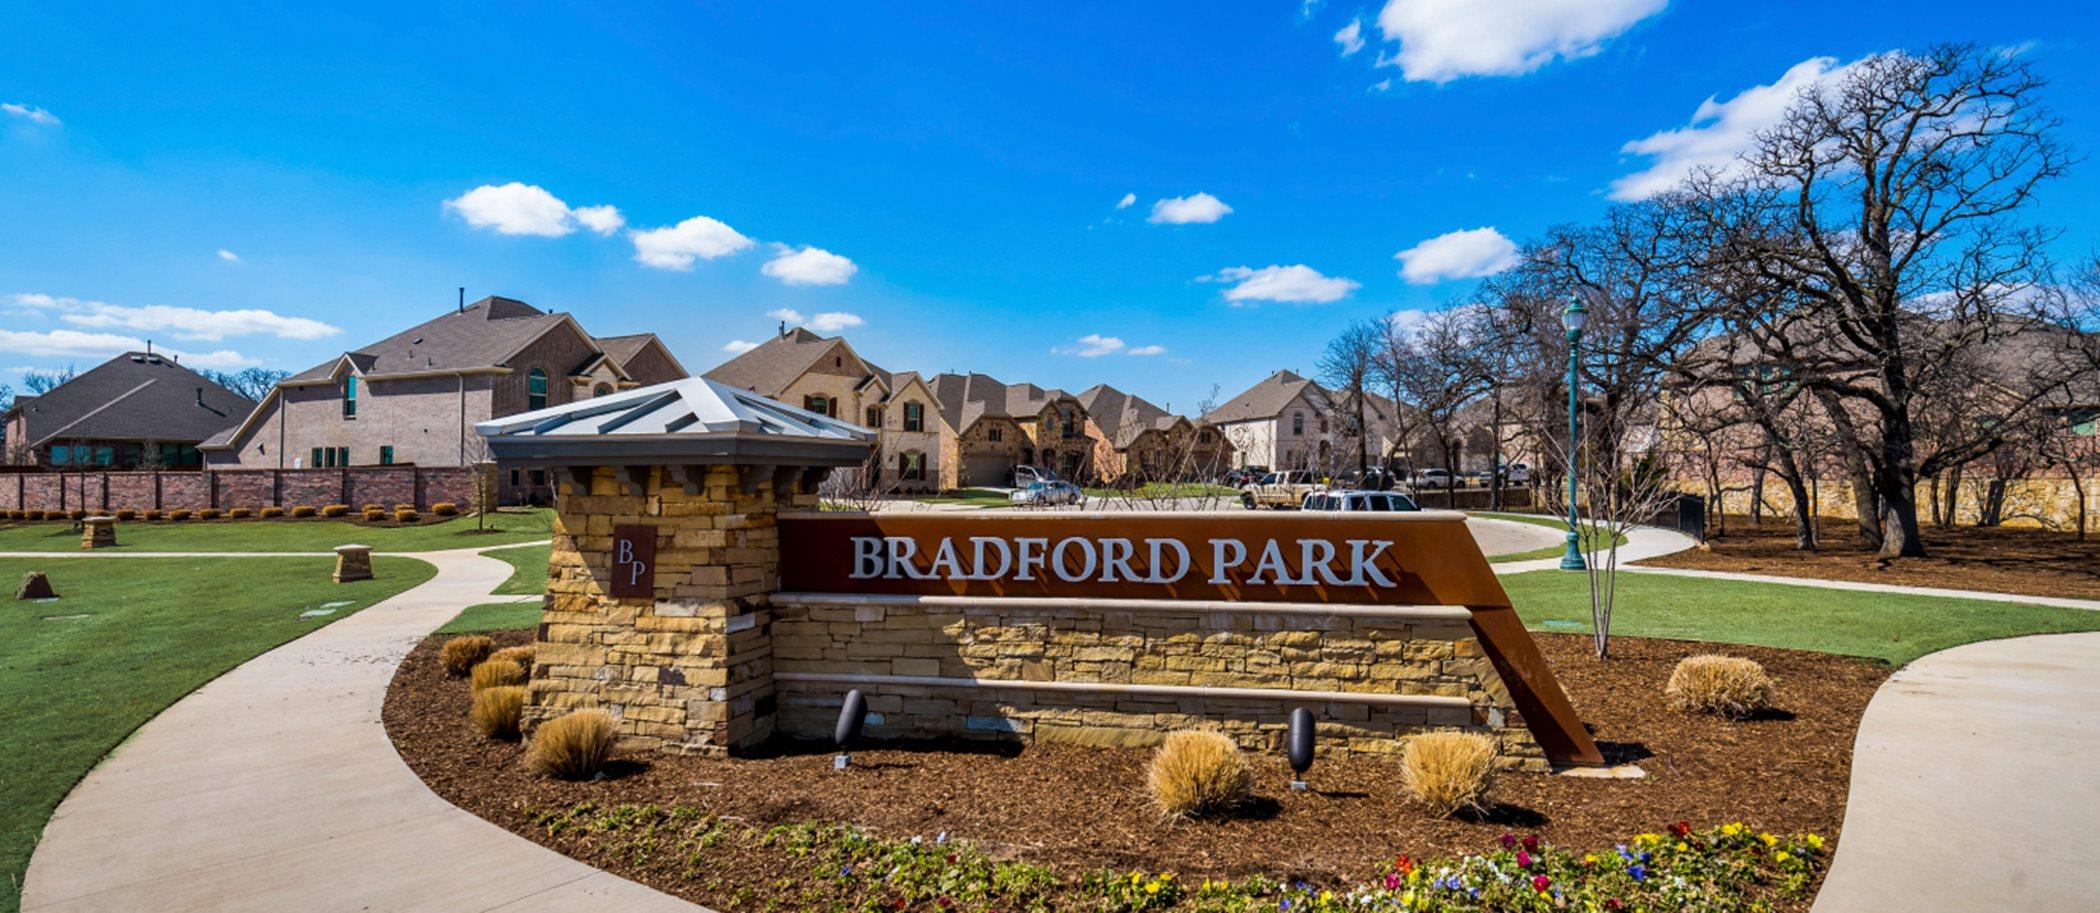 Bradford Park Entrance